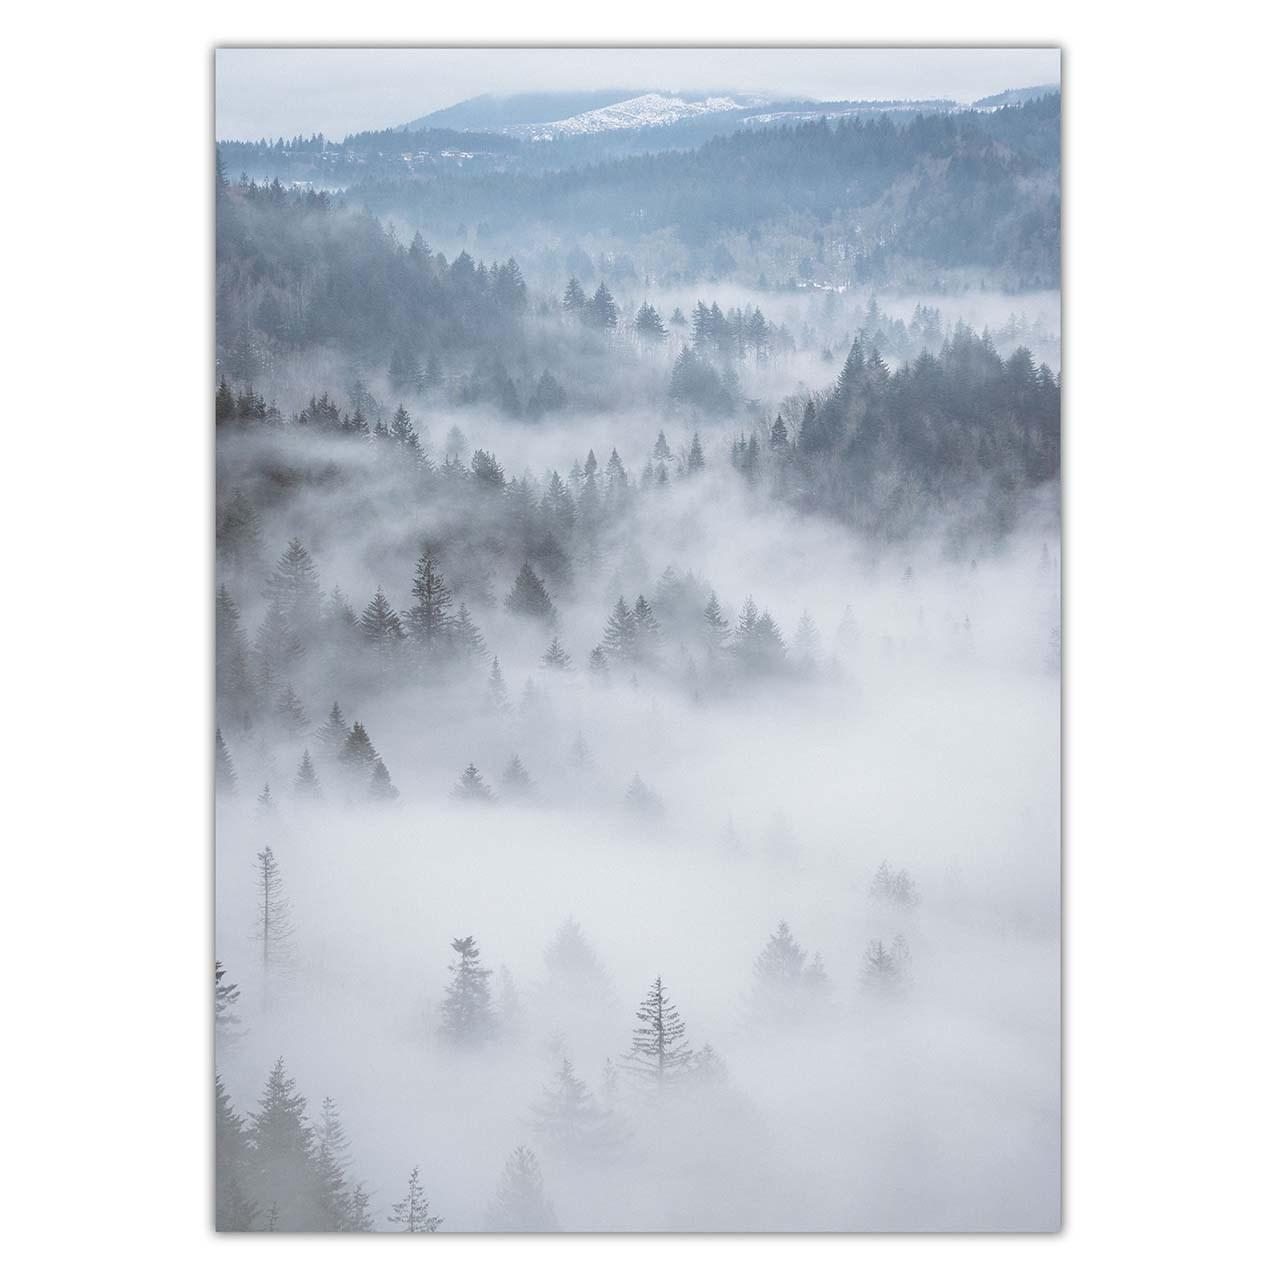 تابلو شاسی ونسونی طرح Heavy Clouds on Mountain سایز 50x70 سانتی متر